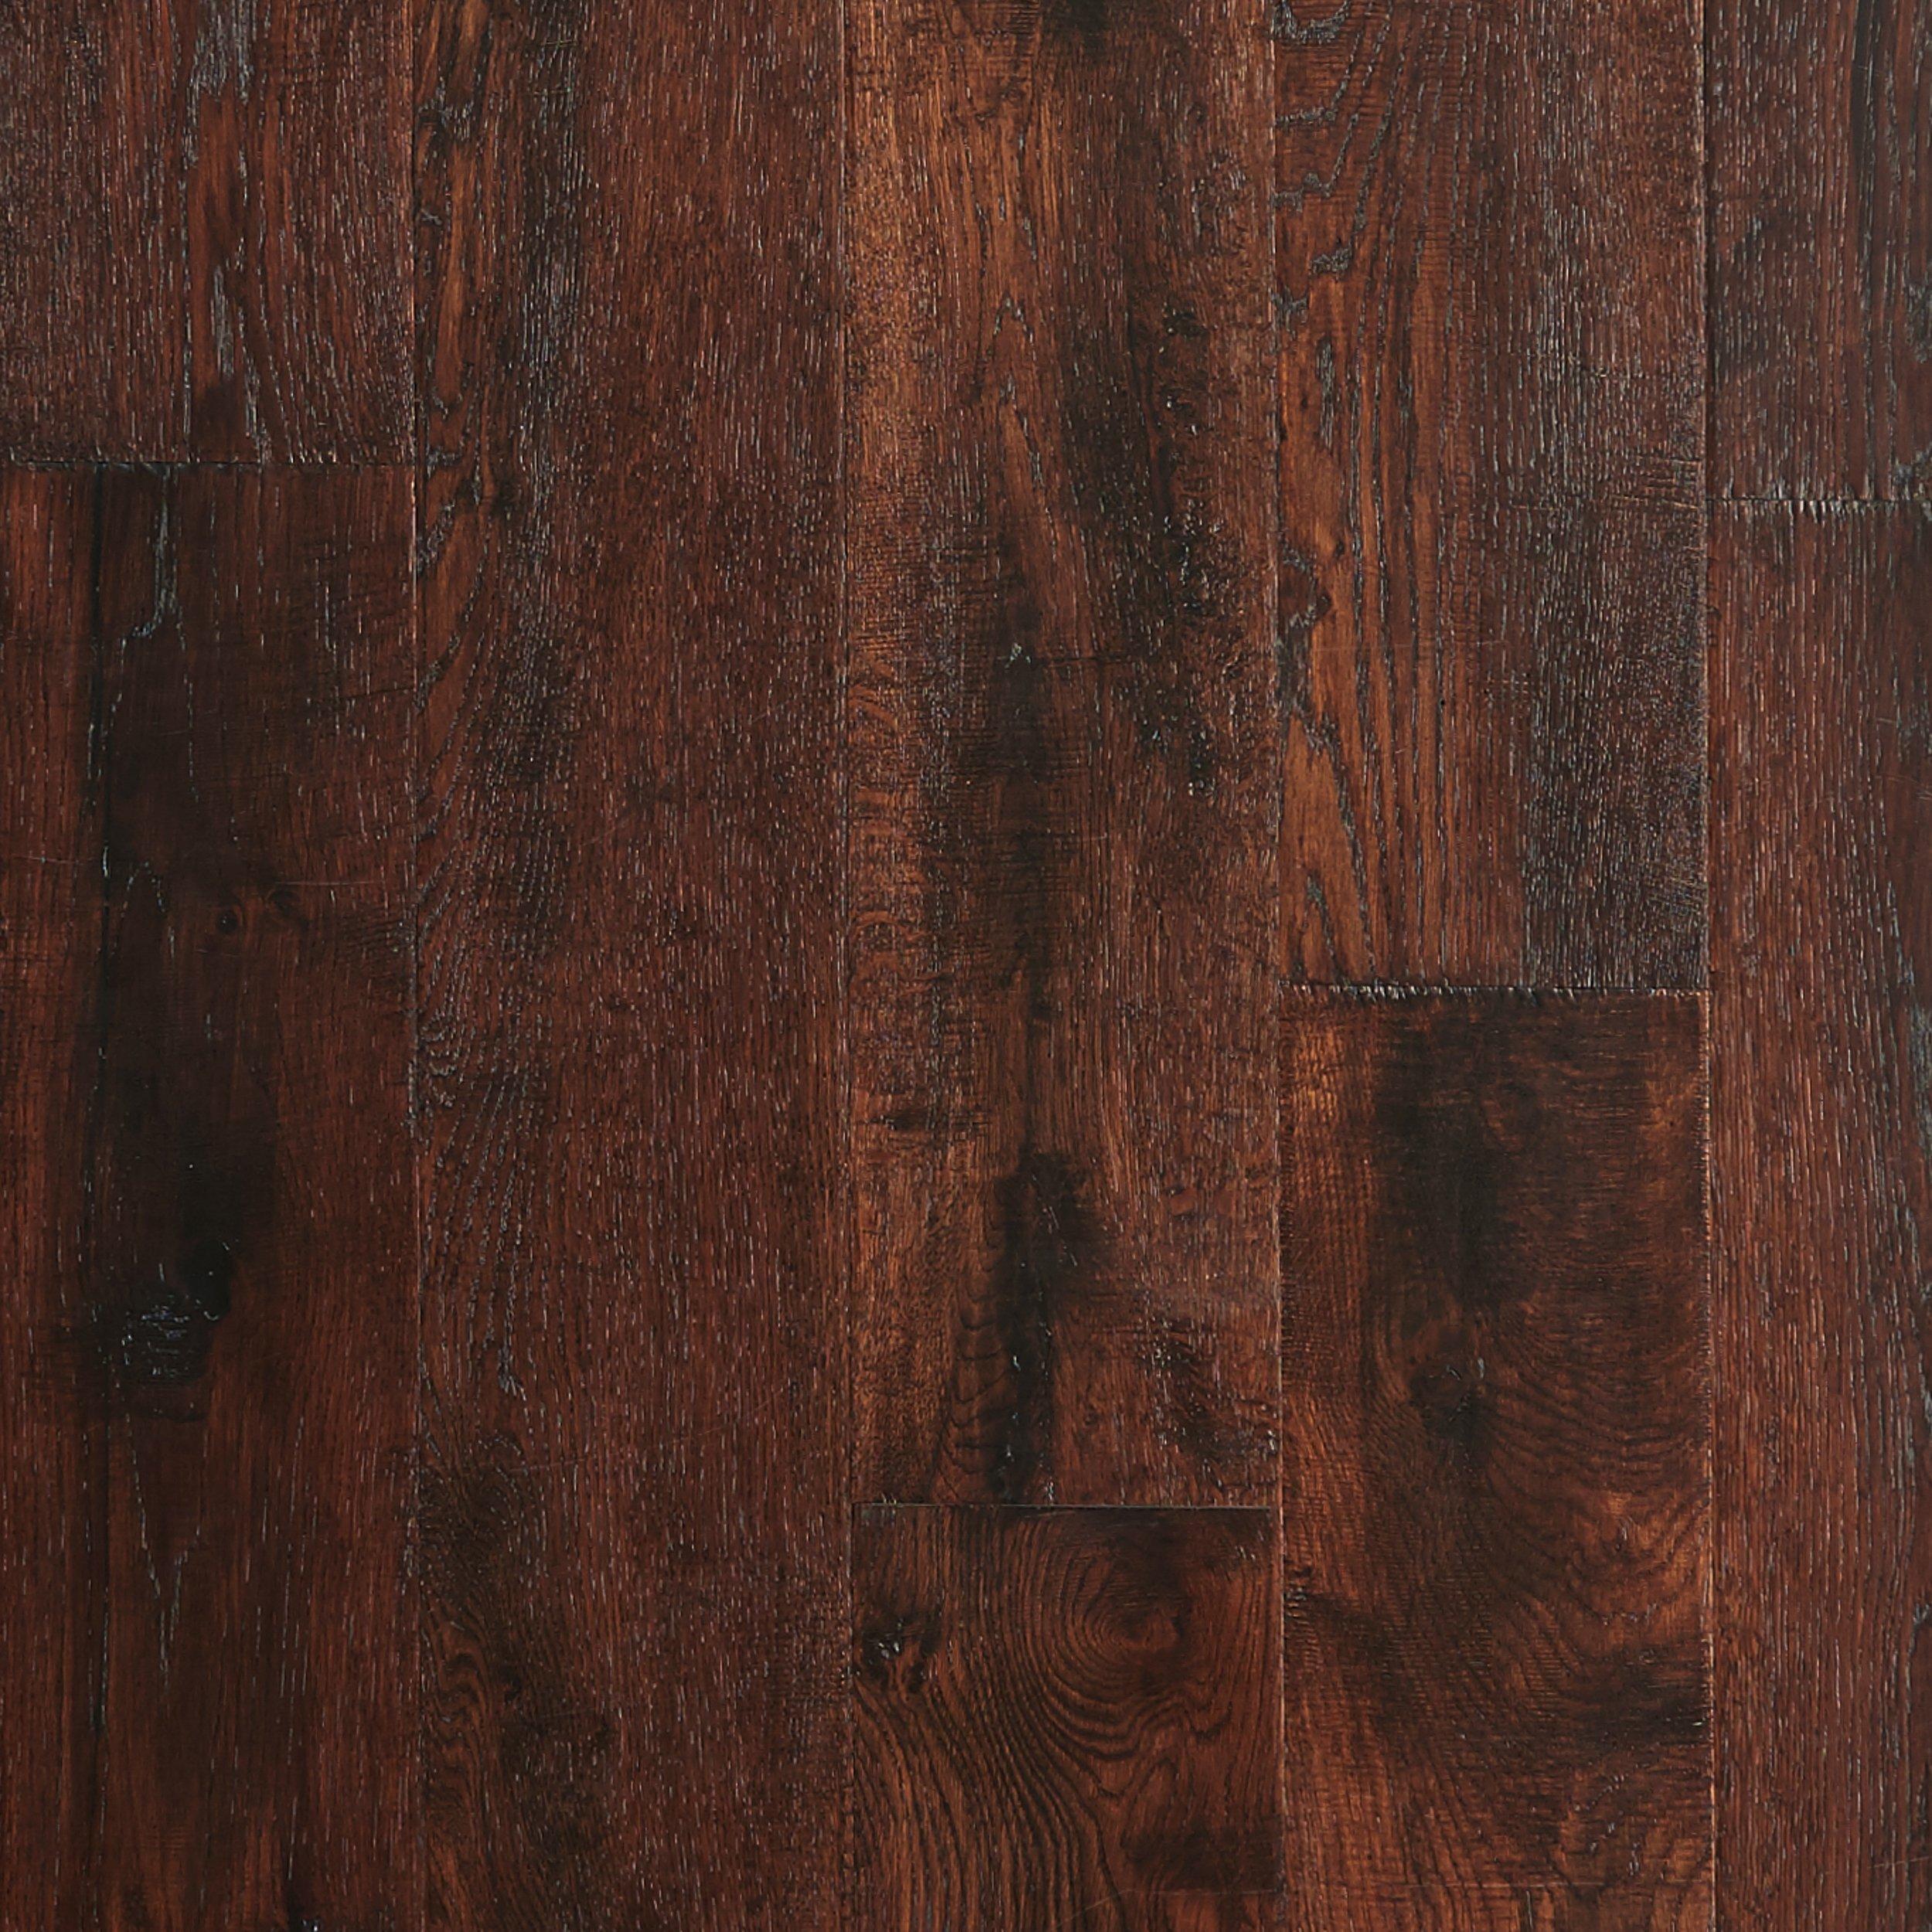 Milan Oak Hand Scraped Engineered Hardwood 3 8in x 6 1 2in